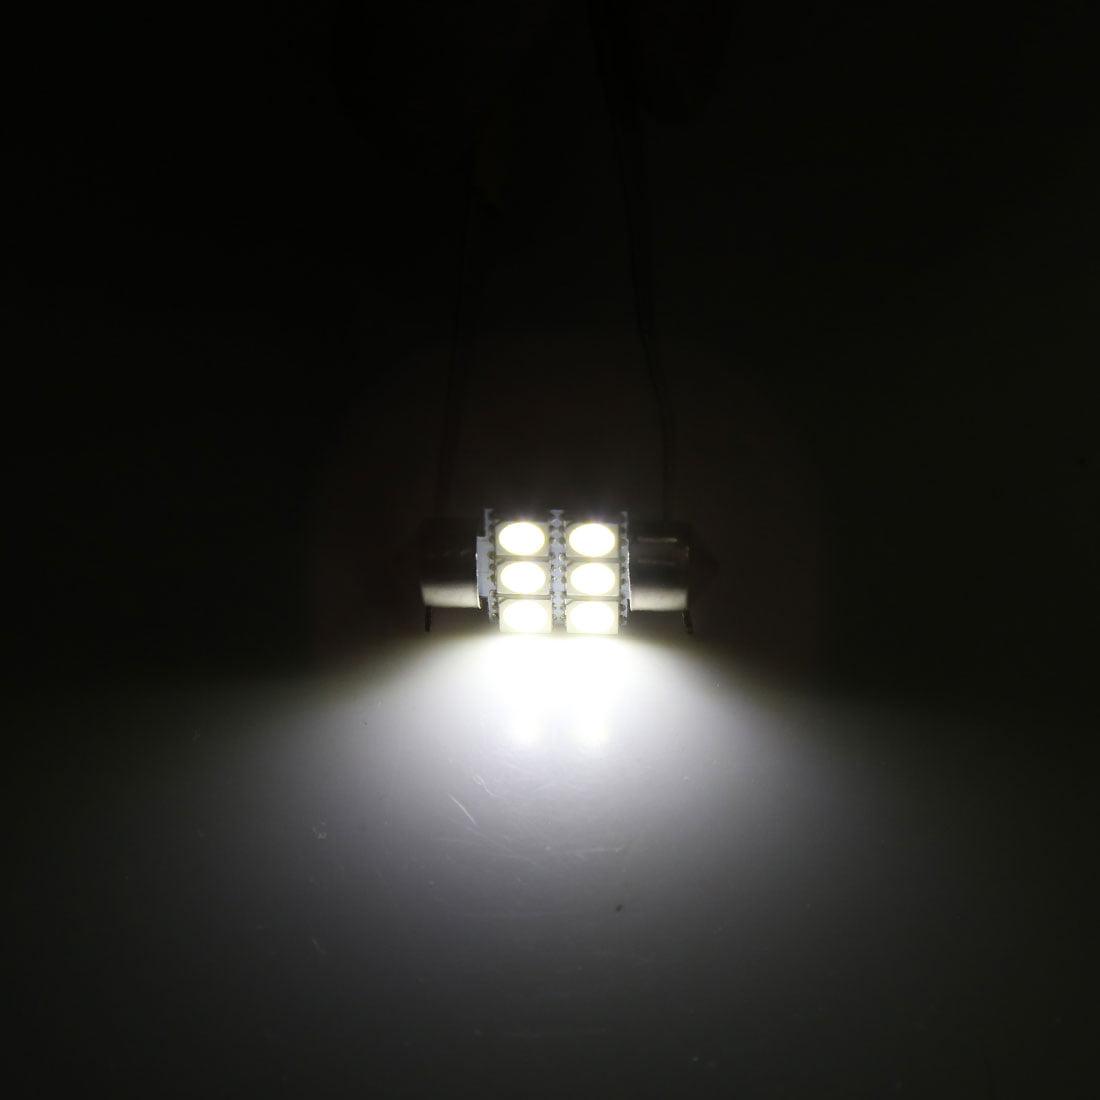 12pcs 31mm 6 LED 5050 SMD Festoon Dome Light Car Interior Bulb White 3022 DE3175 - image 1 of 3